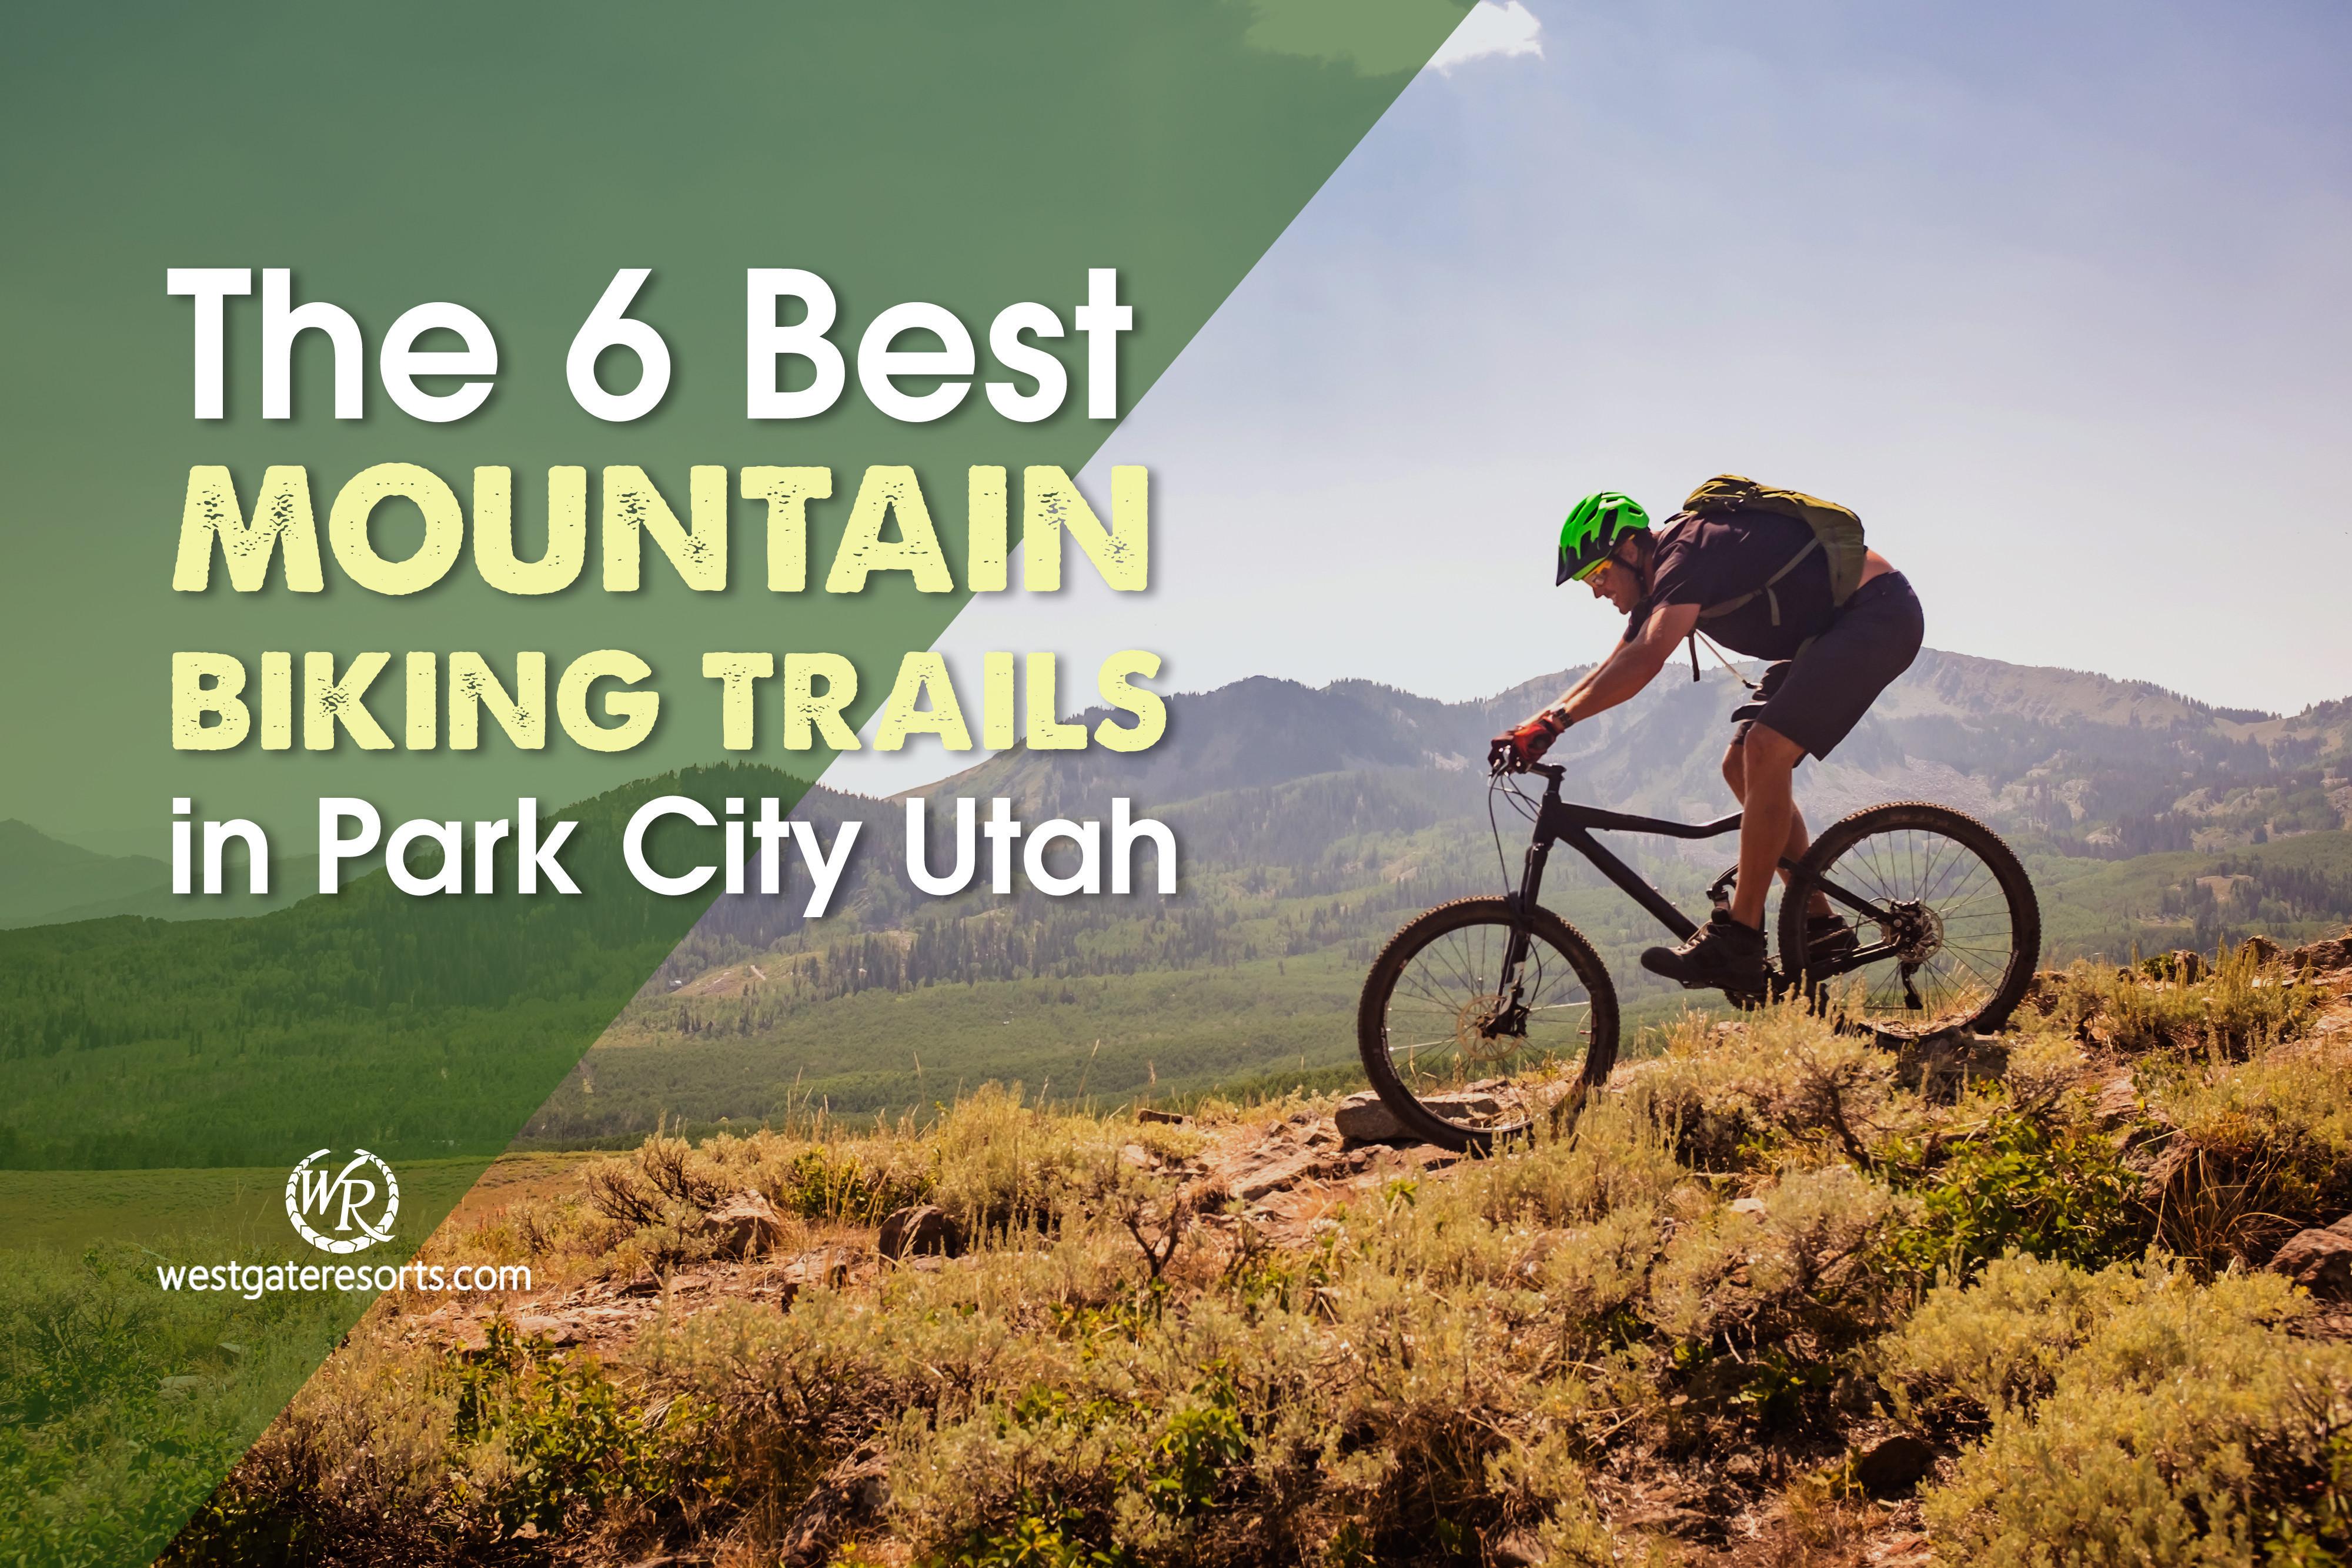 The 6 Best Mountain Biking Trails in Park City Utah | Park City Mountain Biking